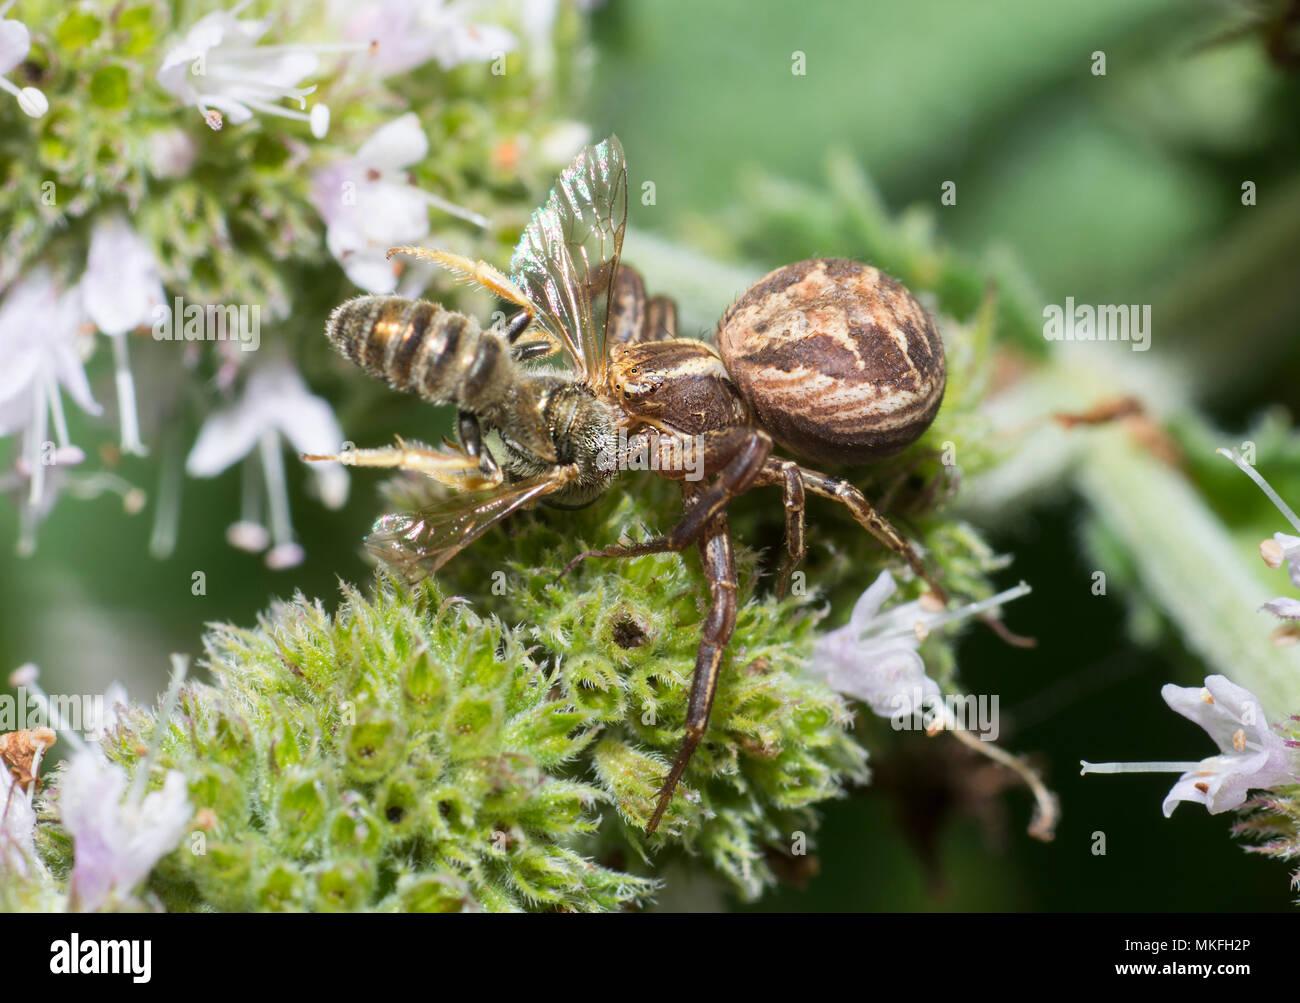 Crab spider (Xysticus bifasciatus) capturing a wild bee (Lasioglossum sp), Regional Natural Park of Northern Vosges, France - Stock Image